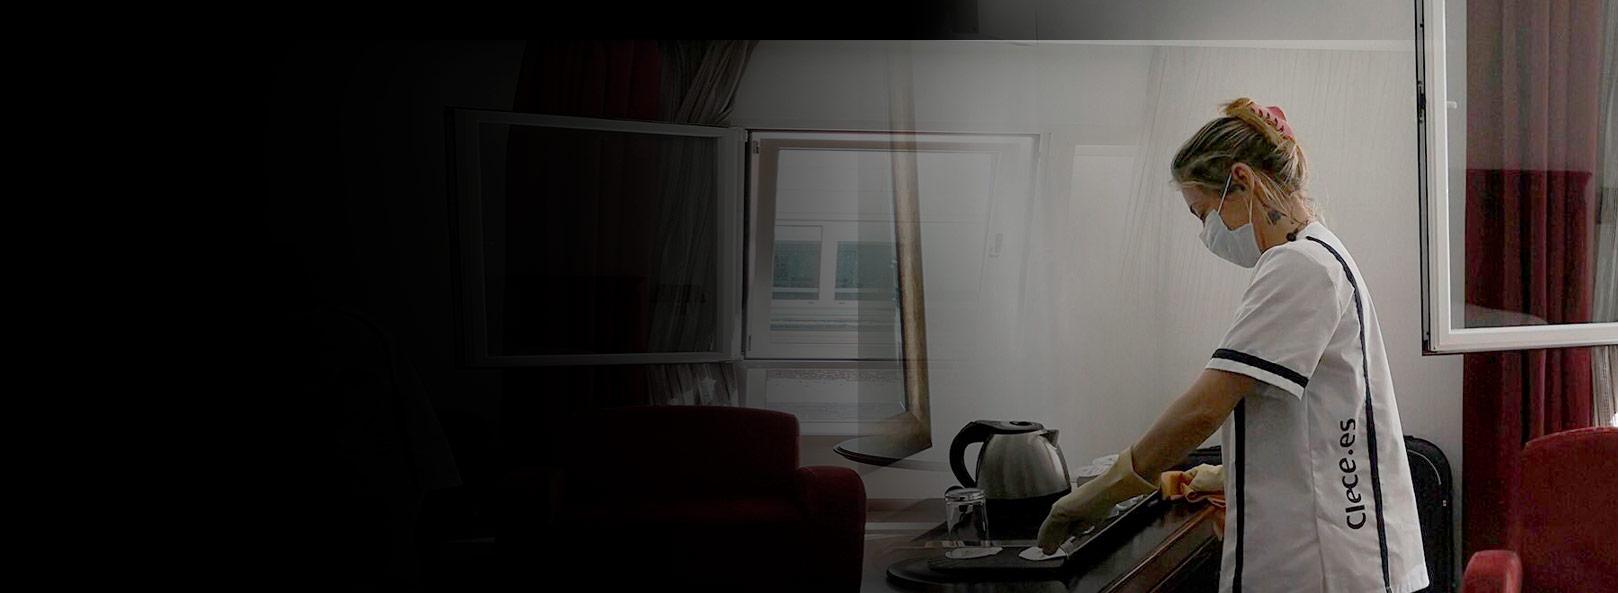 BC-clece-interior (4)